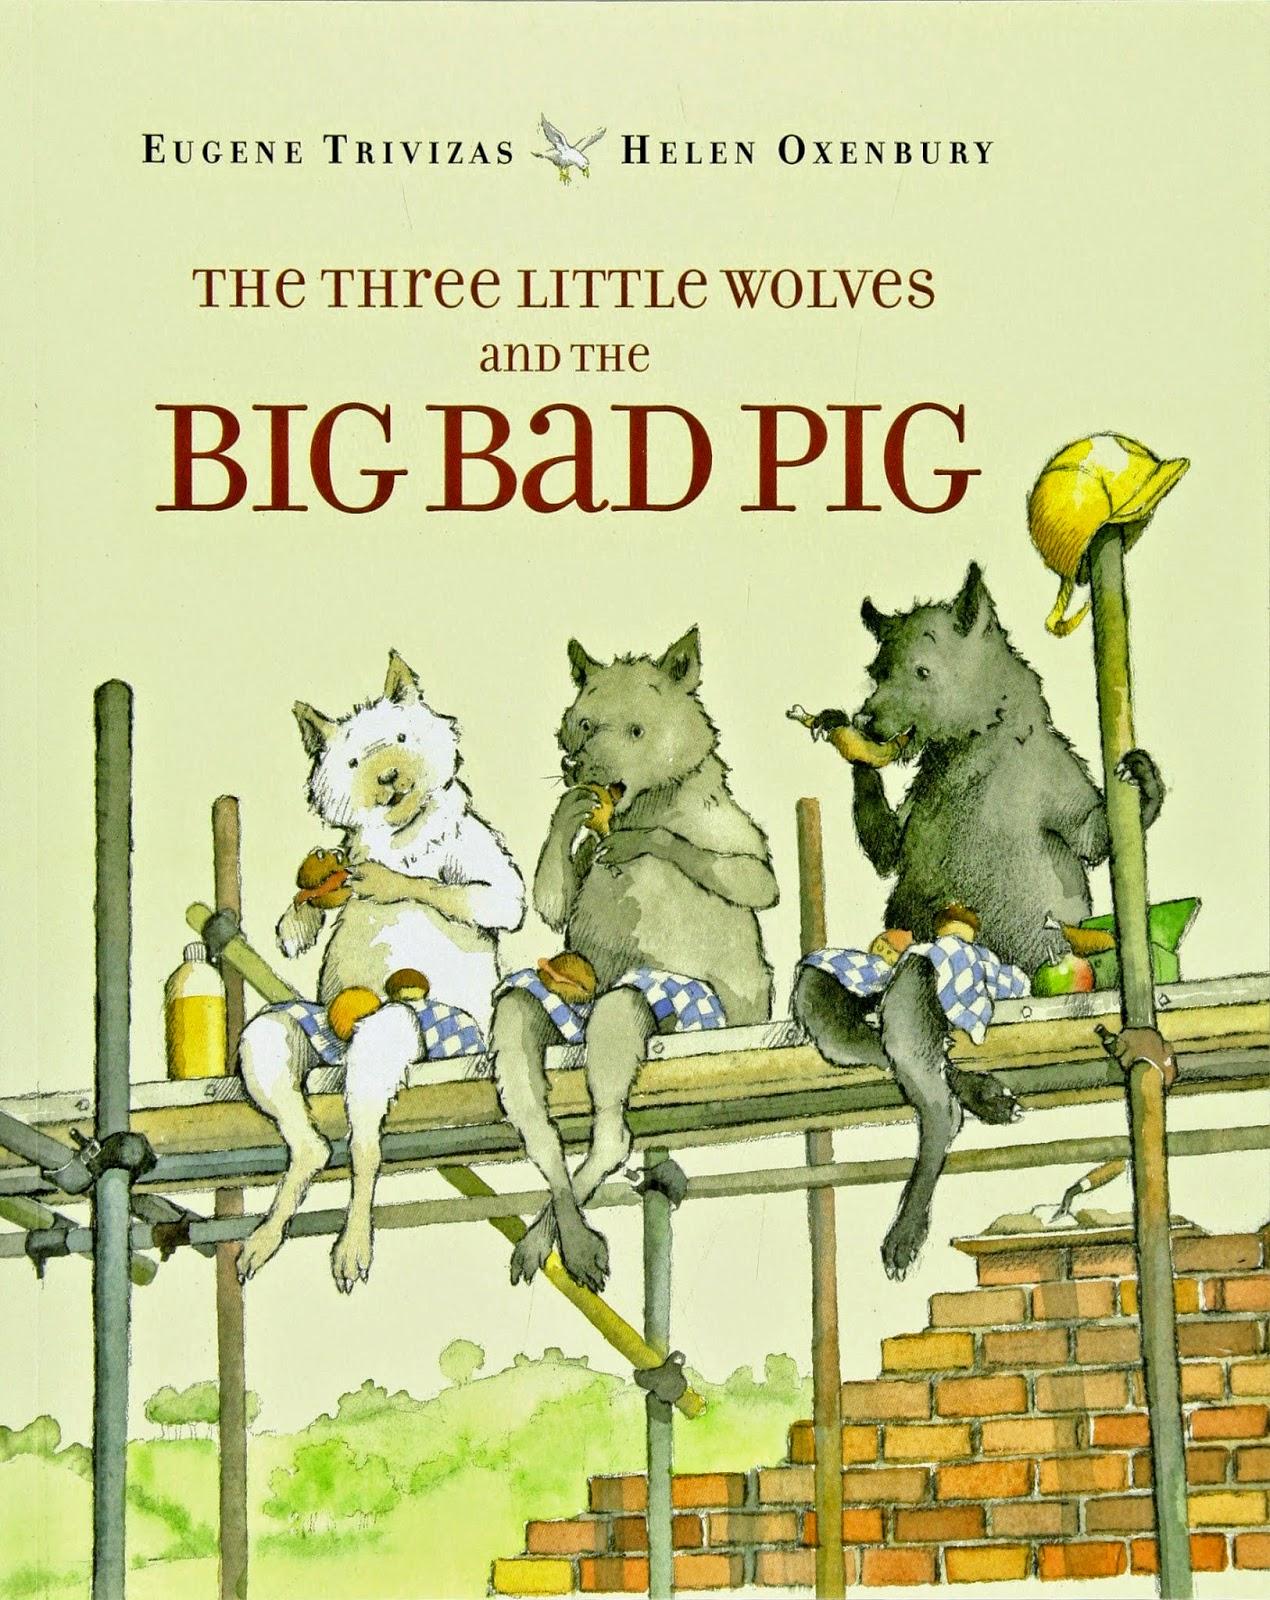 http://www.amazon.com/Three-Little-Wolves-Big-Bad/dp/068981528X/ref=sr_1_1?ie=UTF8&qid=1422377681&sr=8-1&keywords=three+little+wolves